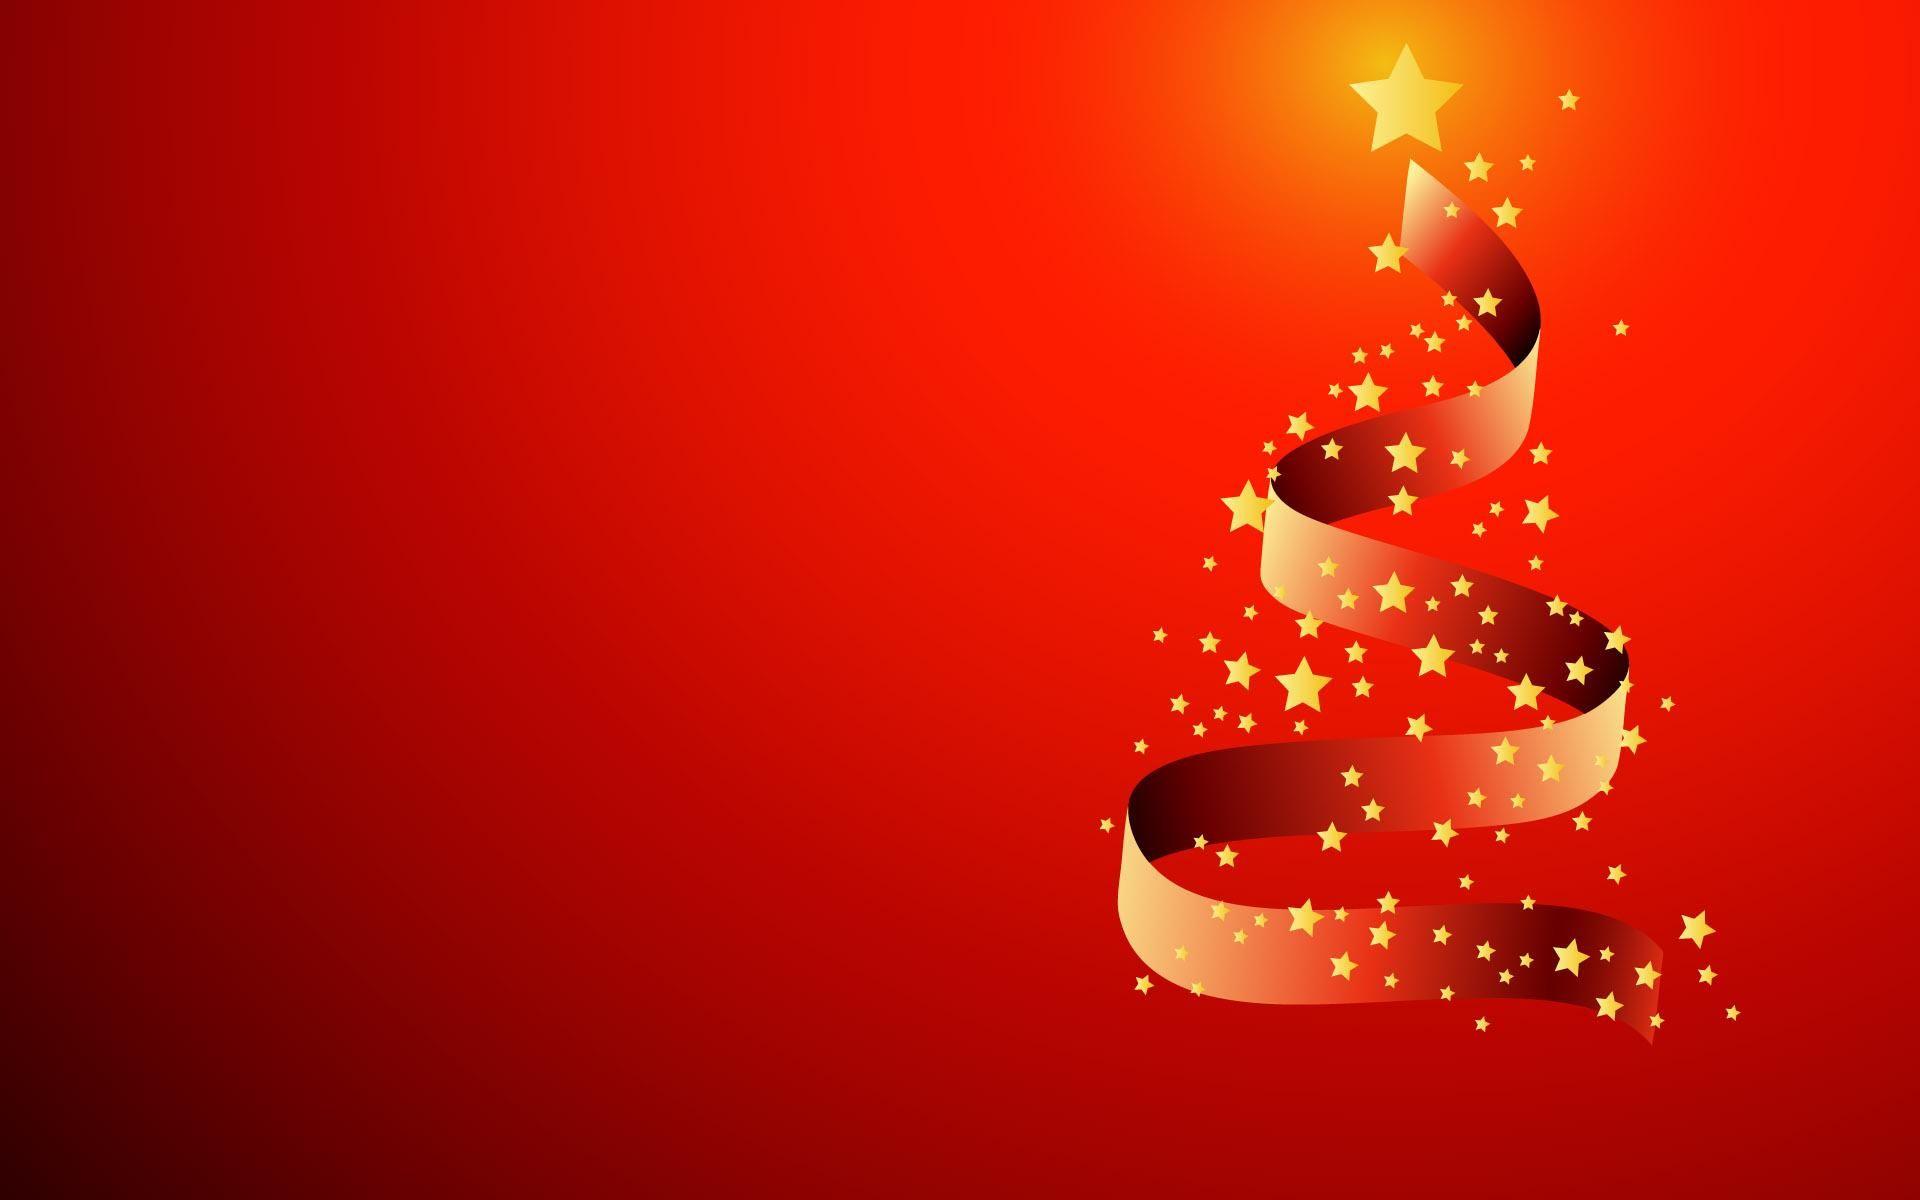 Fondos de navidad hd wallpaper gratis 5 christmas - Dibujos navidad gratis ...